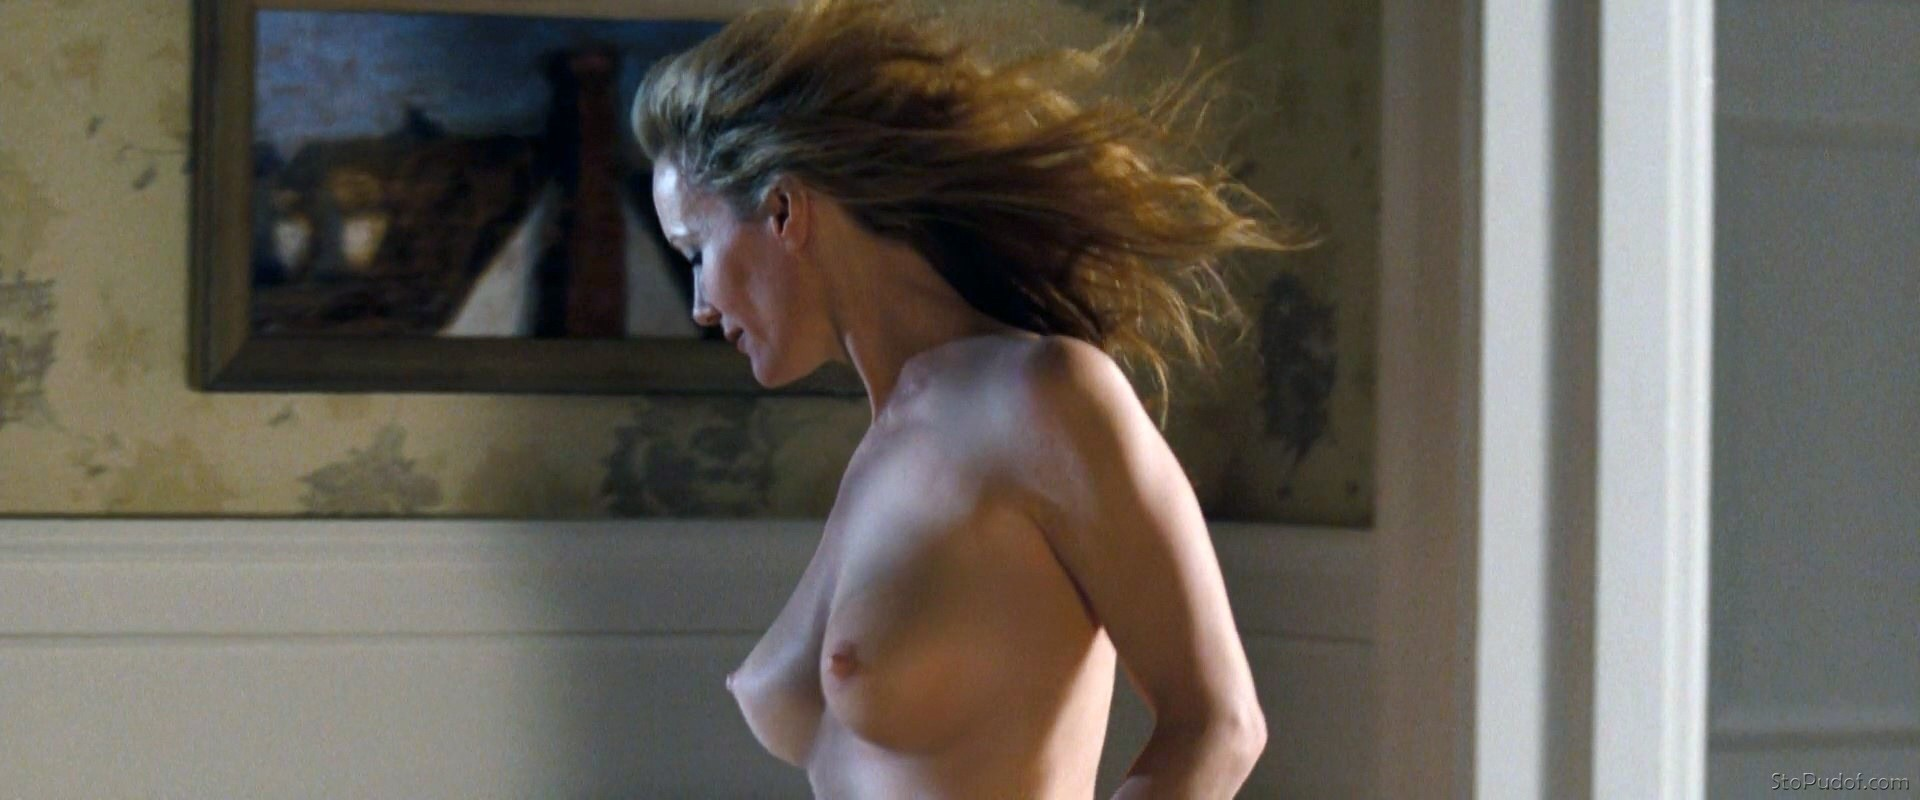 Rebecca manns naked